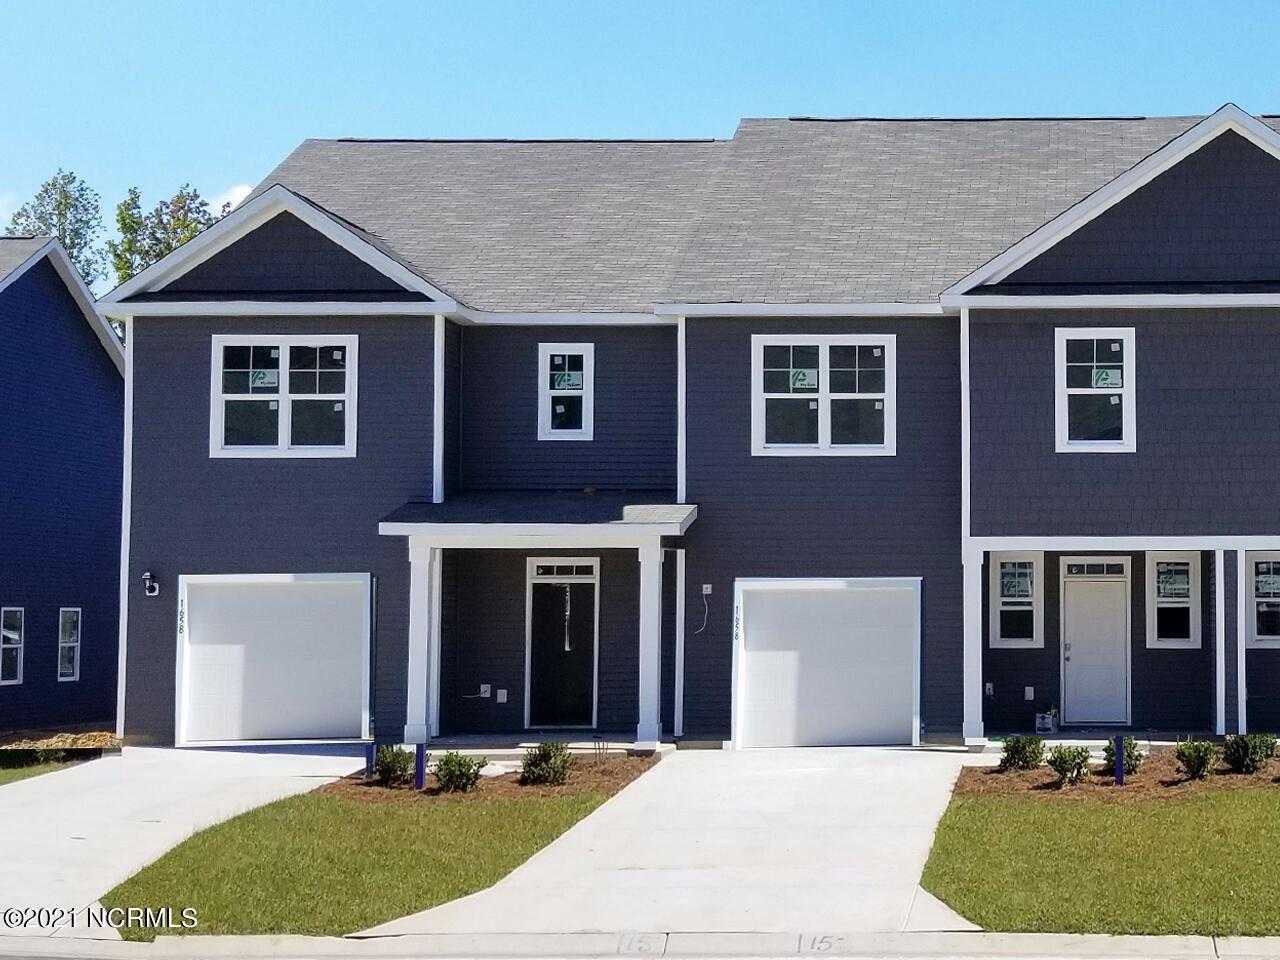 Photo of 1655 Killdeer Lane #Unit 3, Wilmington, NC 28411 (MLS # 100275079)